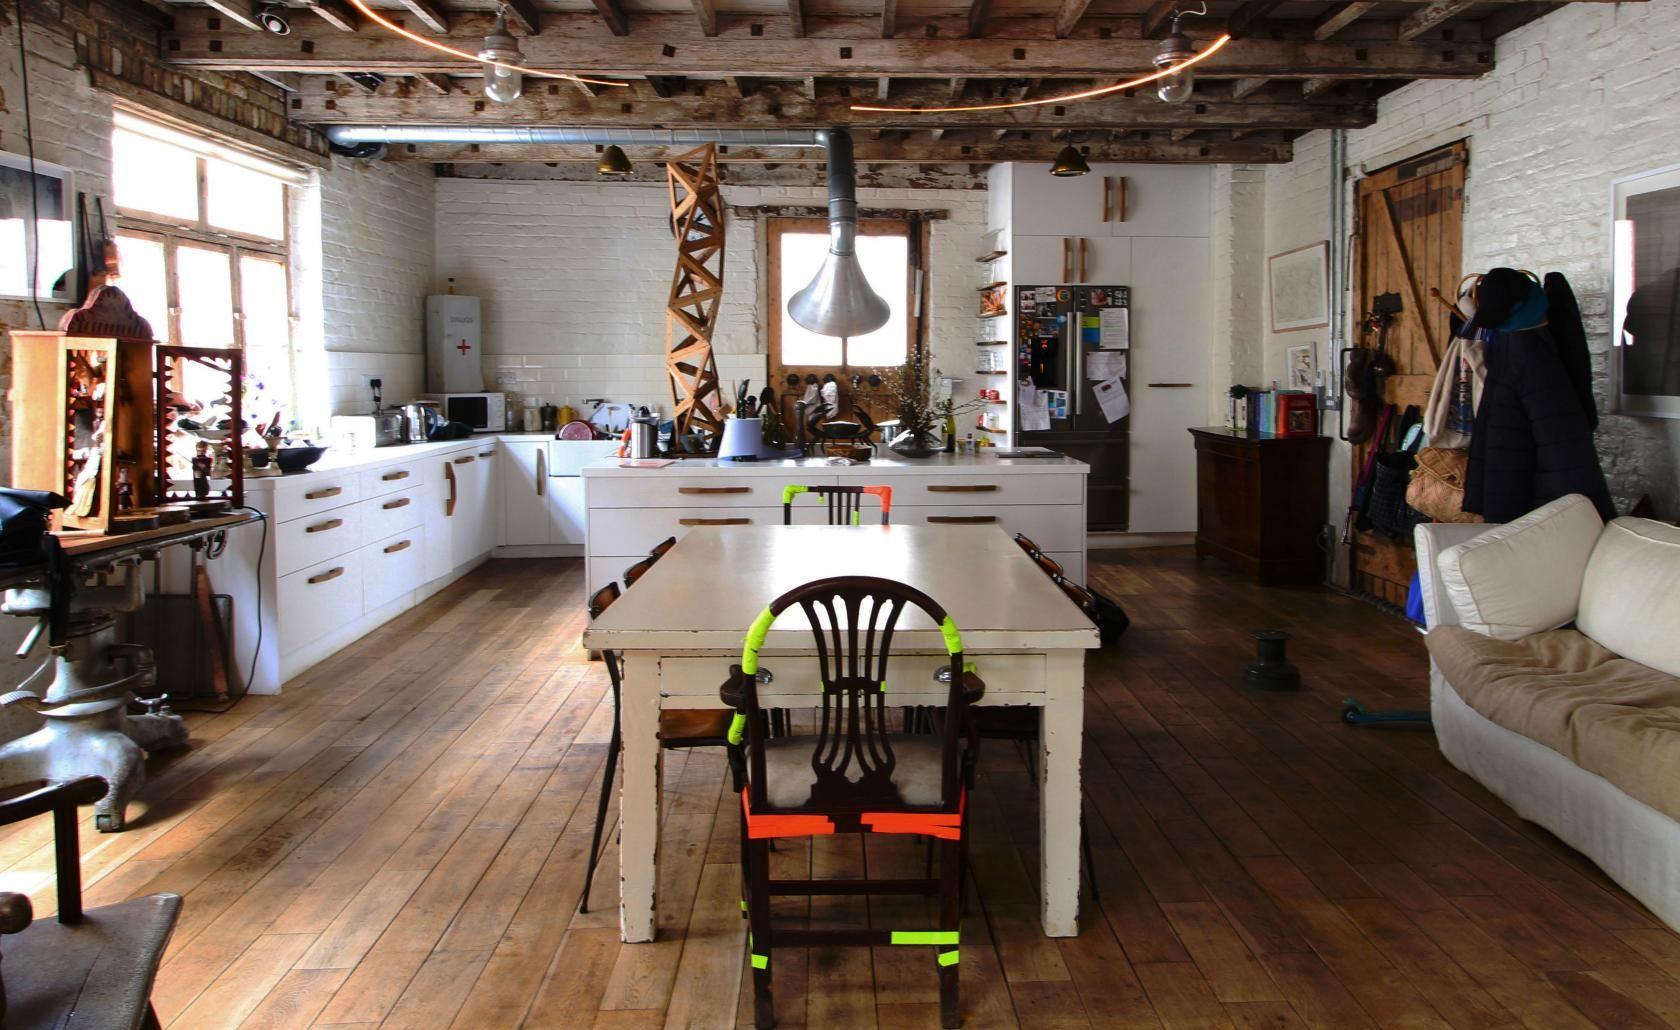 Inside artist Conrad Shawcross' house and studio in east